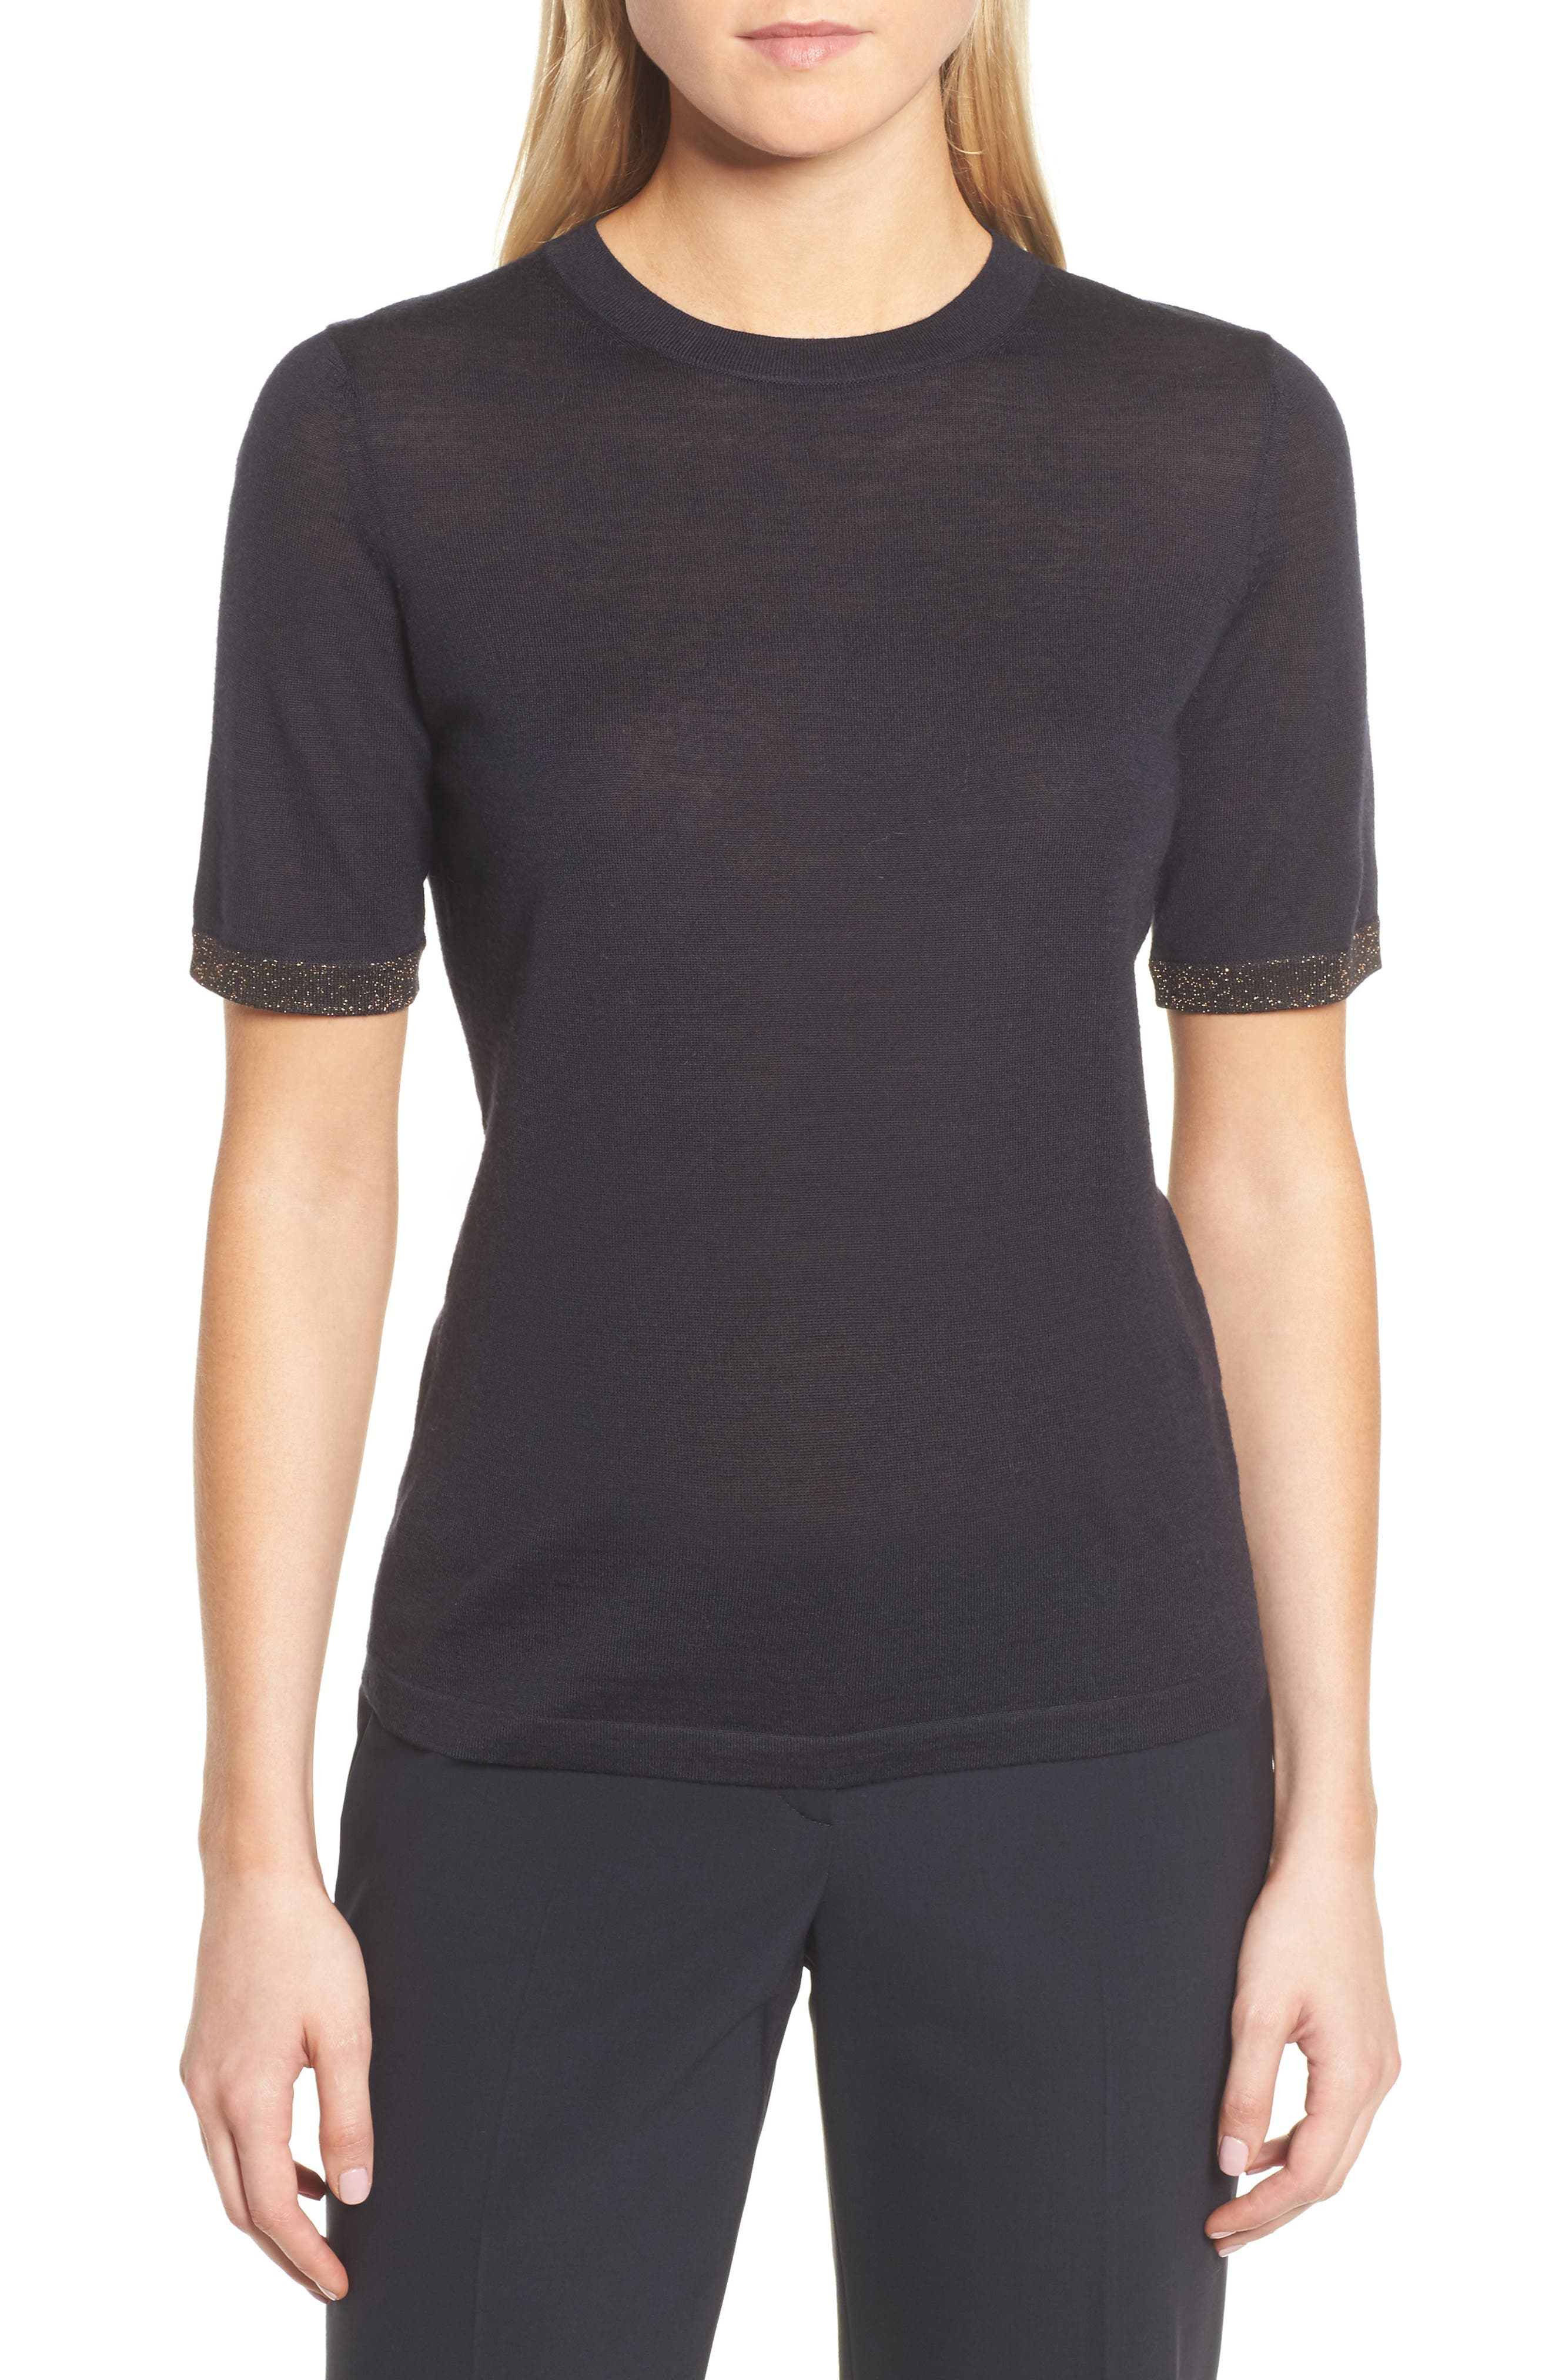 Alternate Image 1 Selected - BOSS Fifet Sparkle Trim Sweater